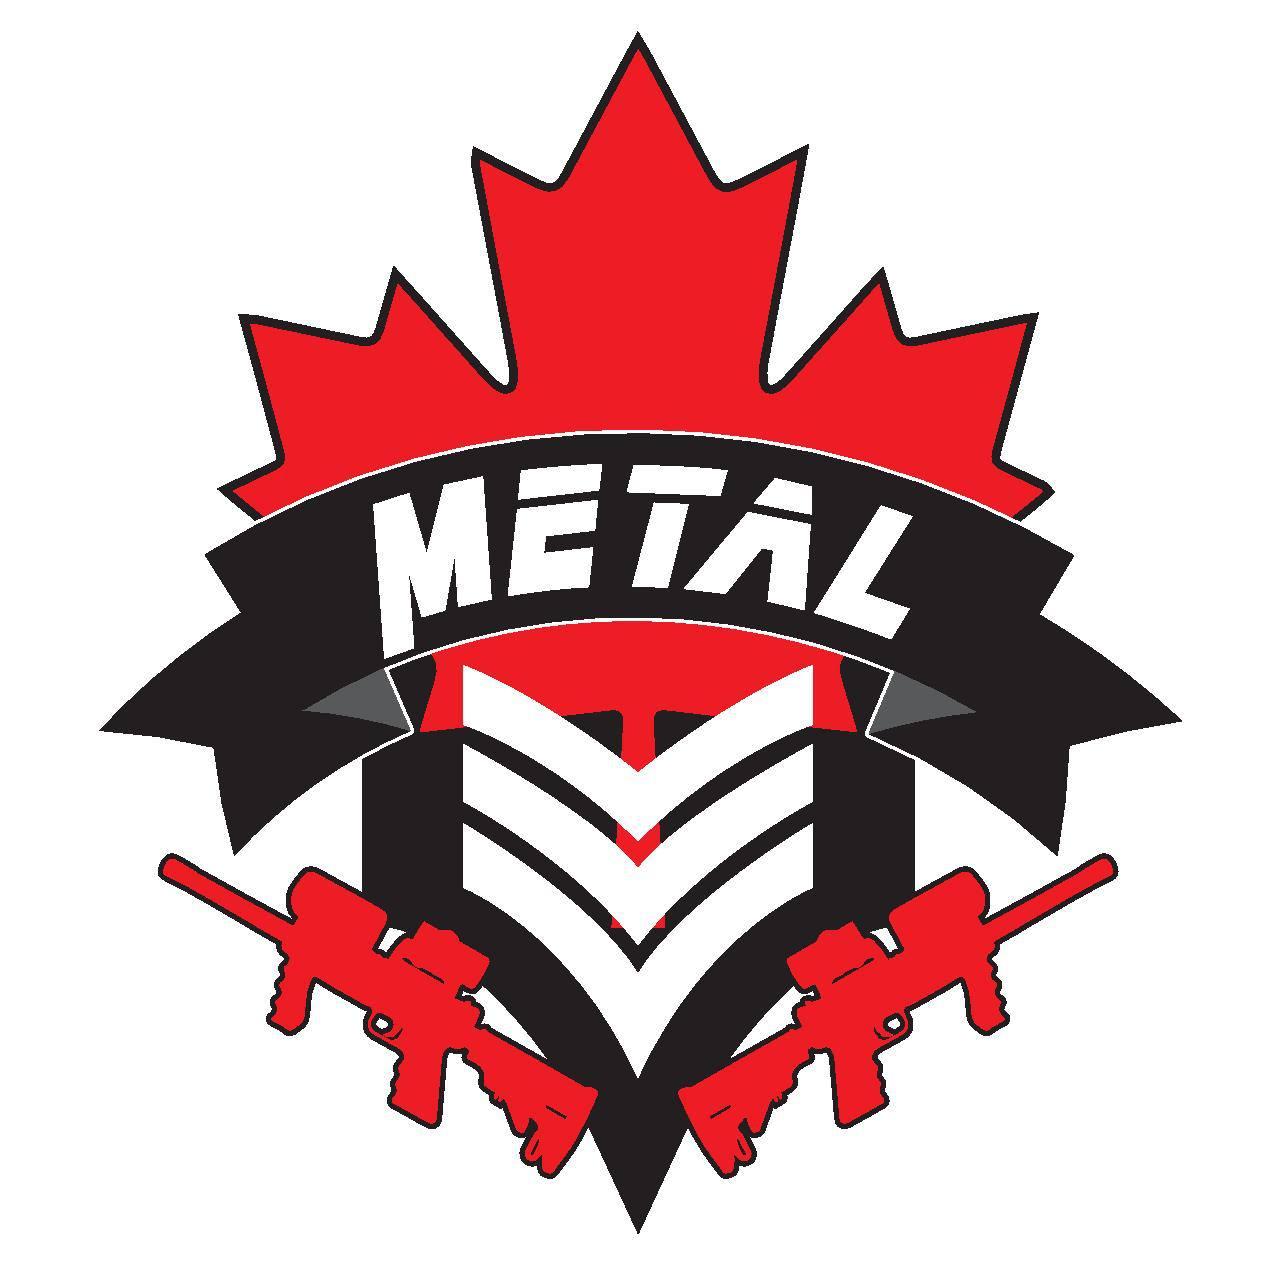 METAL - Mission Edmonton Tactical Laser